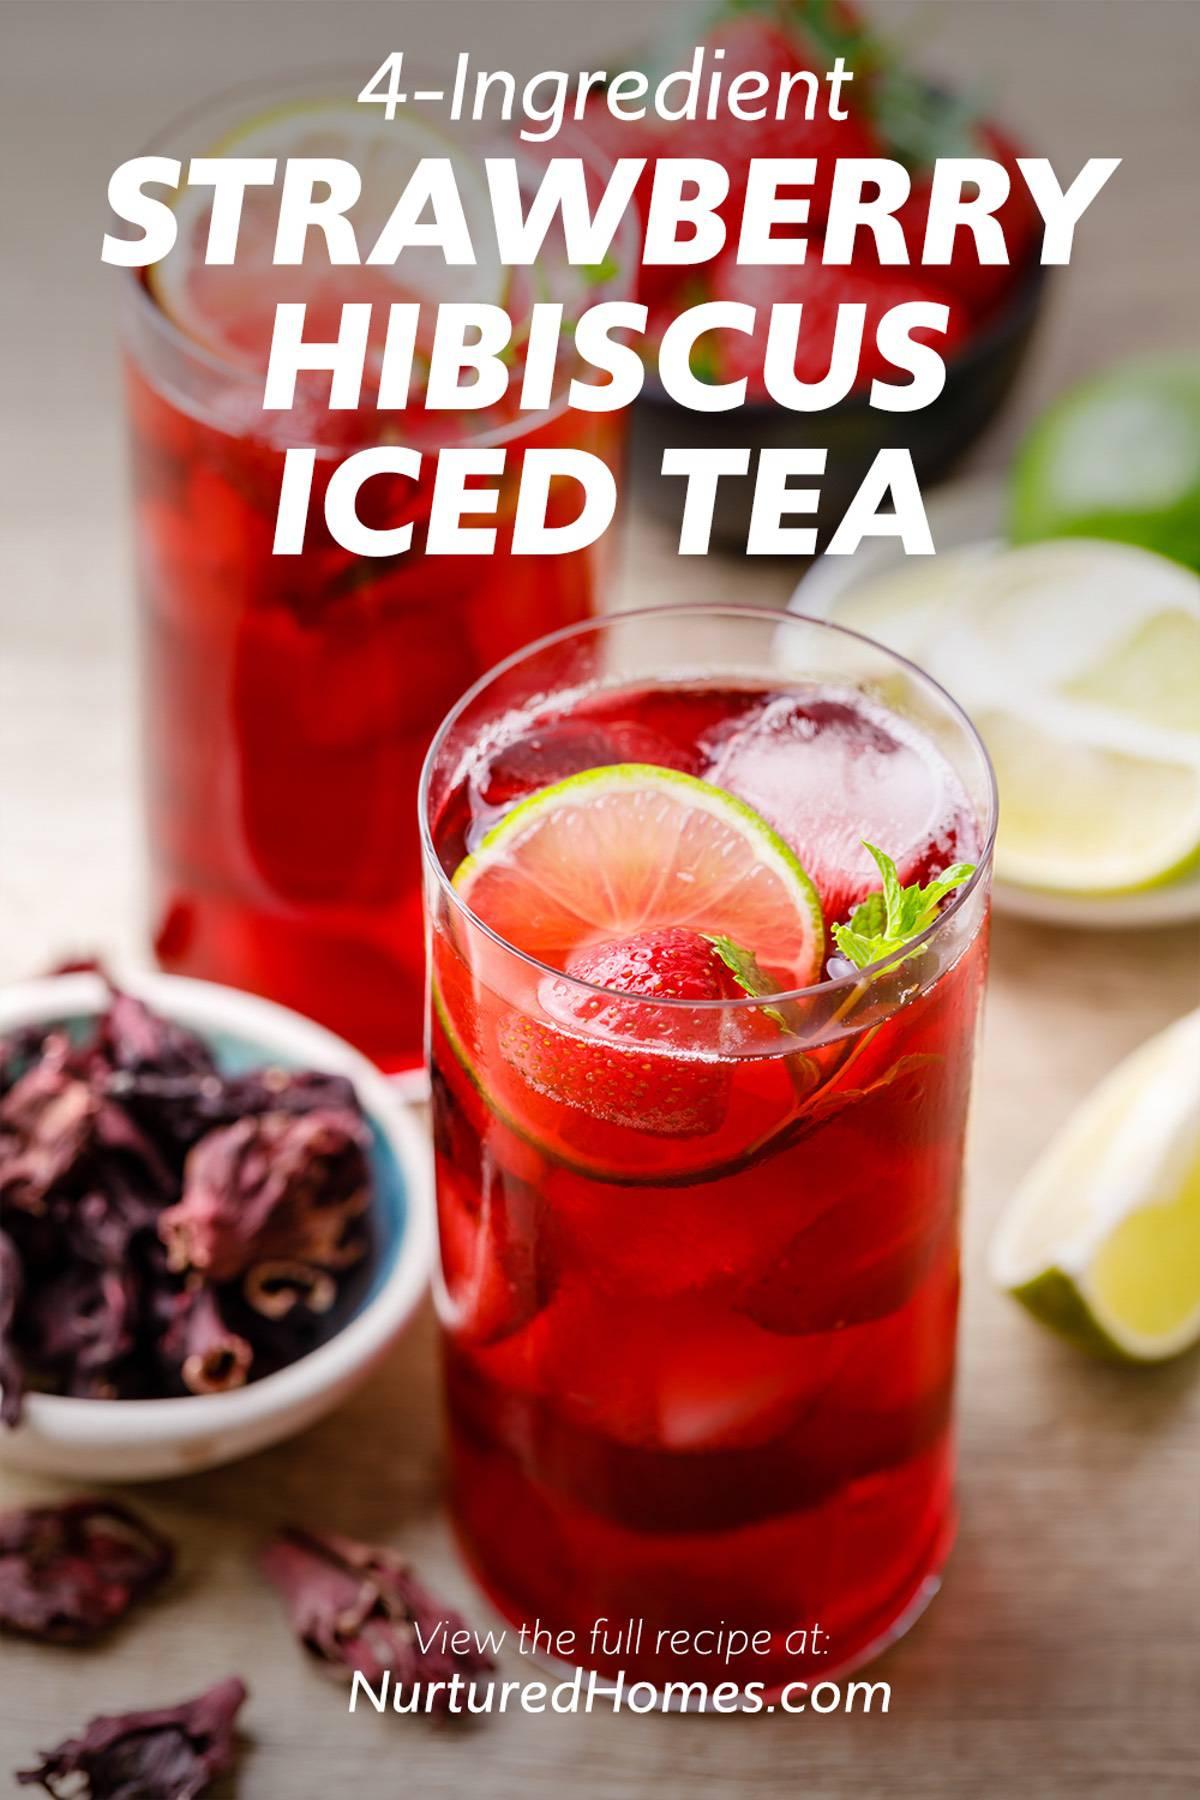 4-Ingredient Strawberry Hibiscus Iced Tea